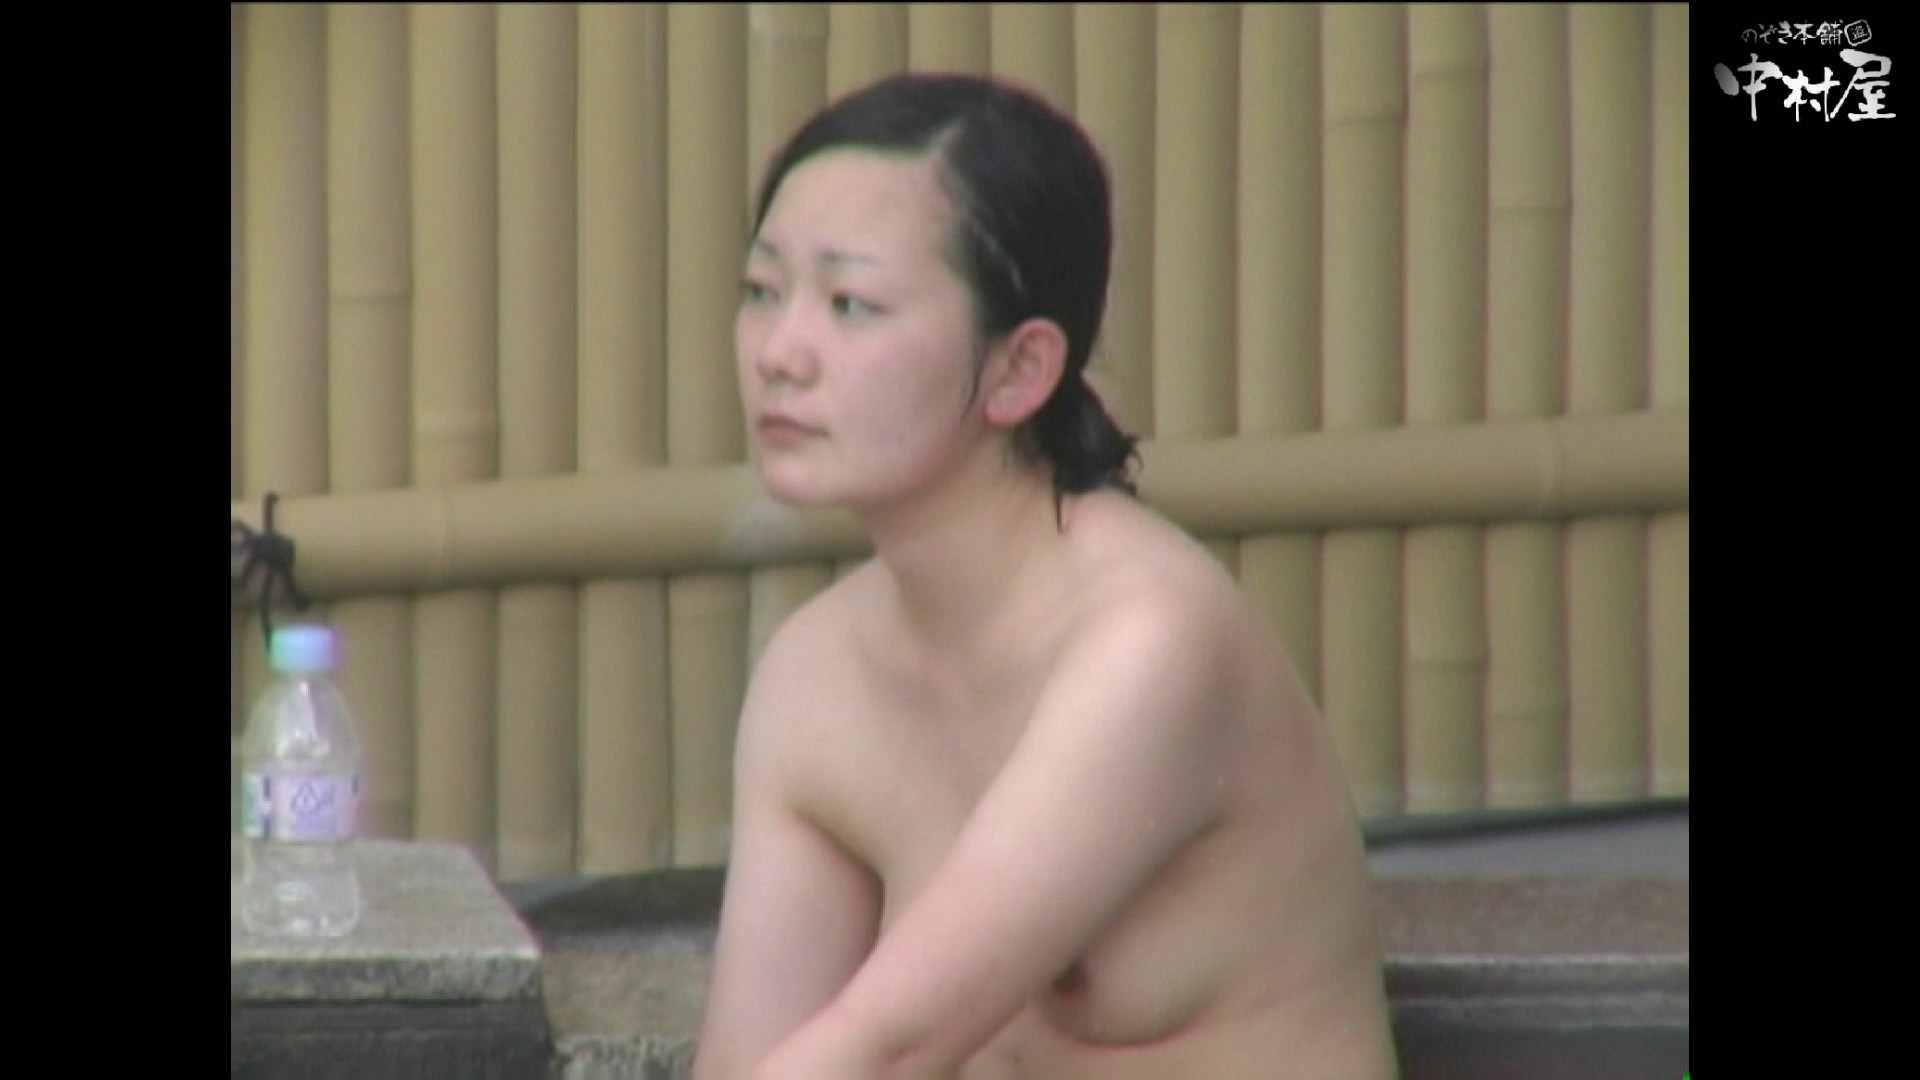 Aquaな露天風呂Vol.892 盗撮師作品  72pic 54